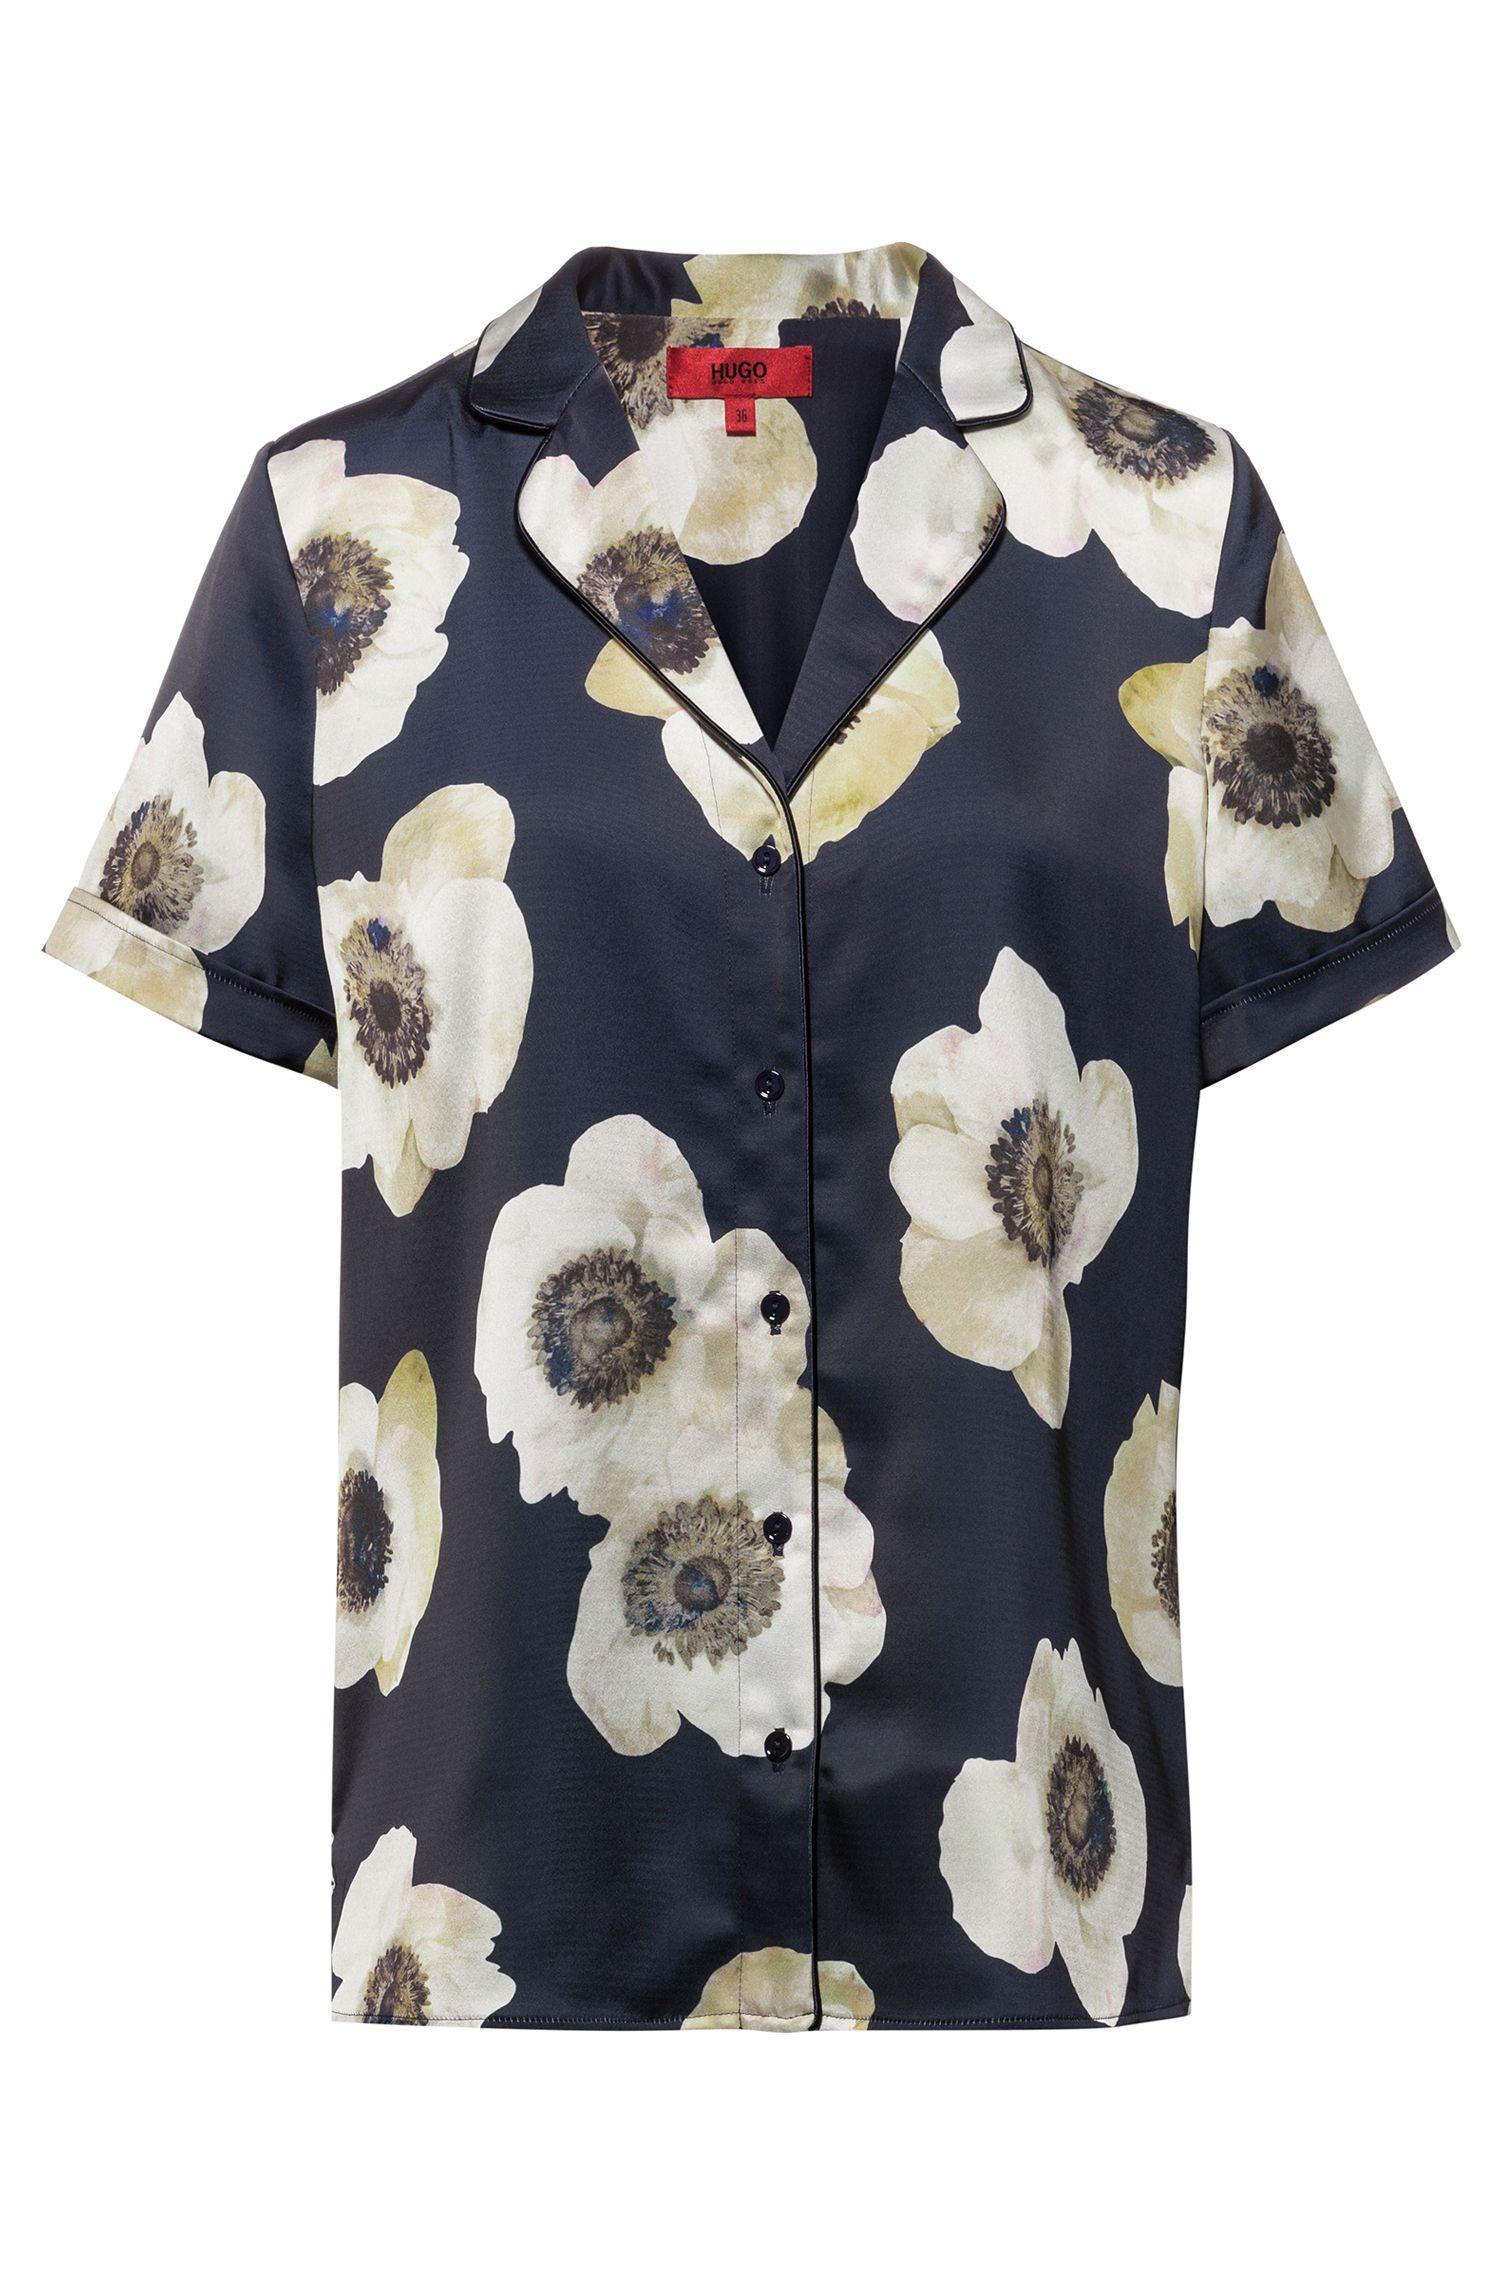 Kurzarm-Bluse im Pyjama-Stil mit Anemonen-Print, Gemustert